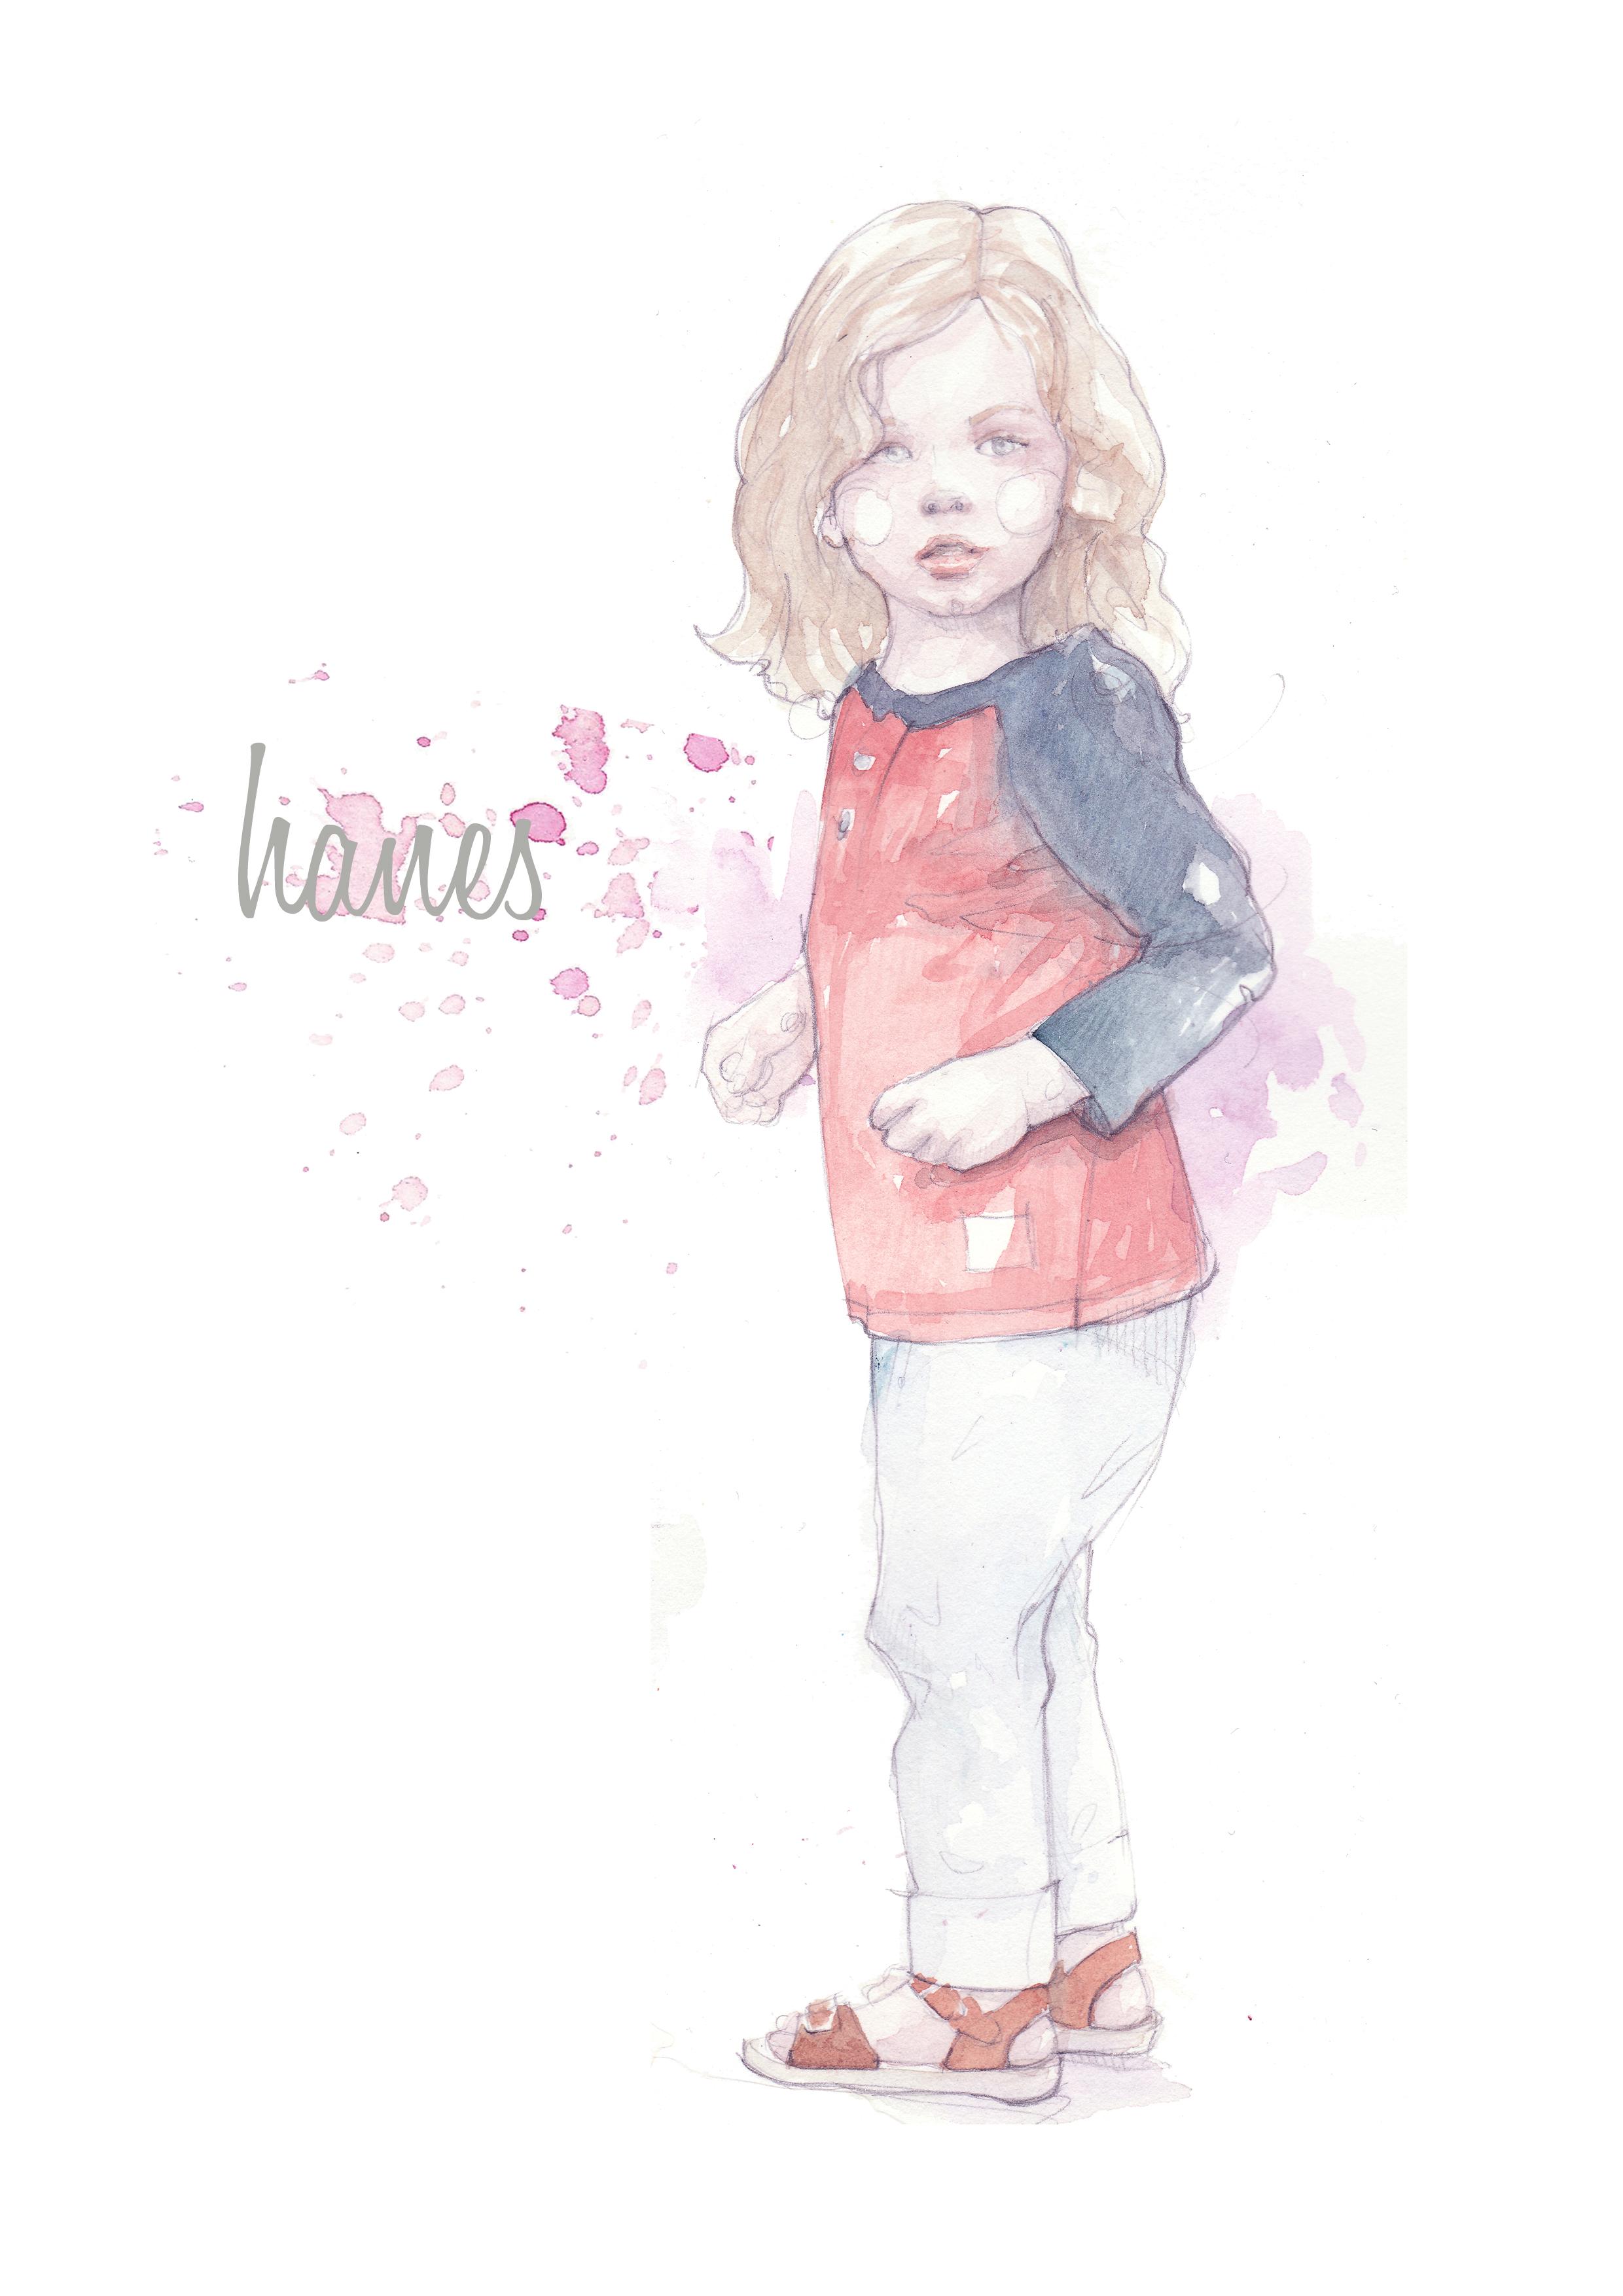 Cute Little Girl Cartoon Wallpaper Watercolor Illustration Kids Pinodesk